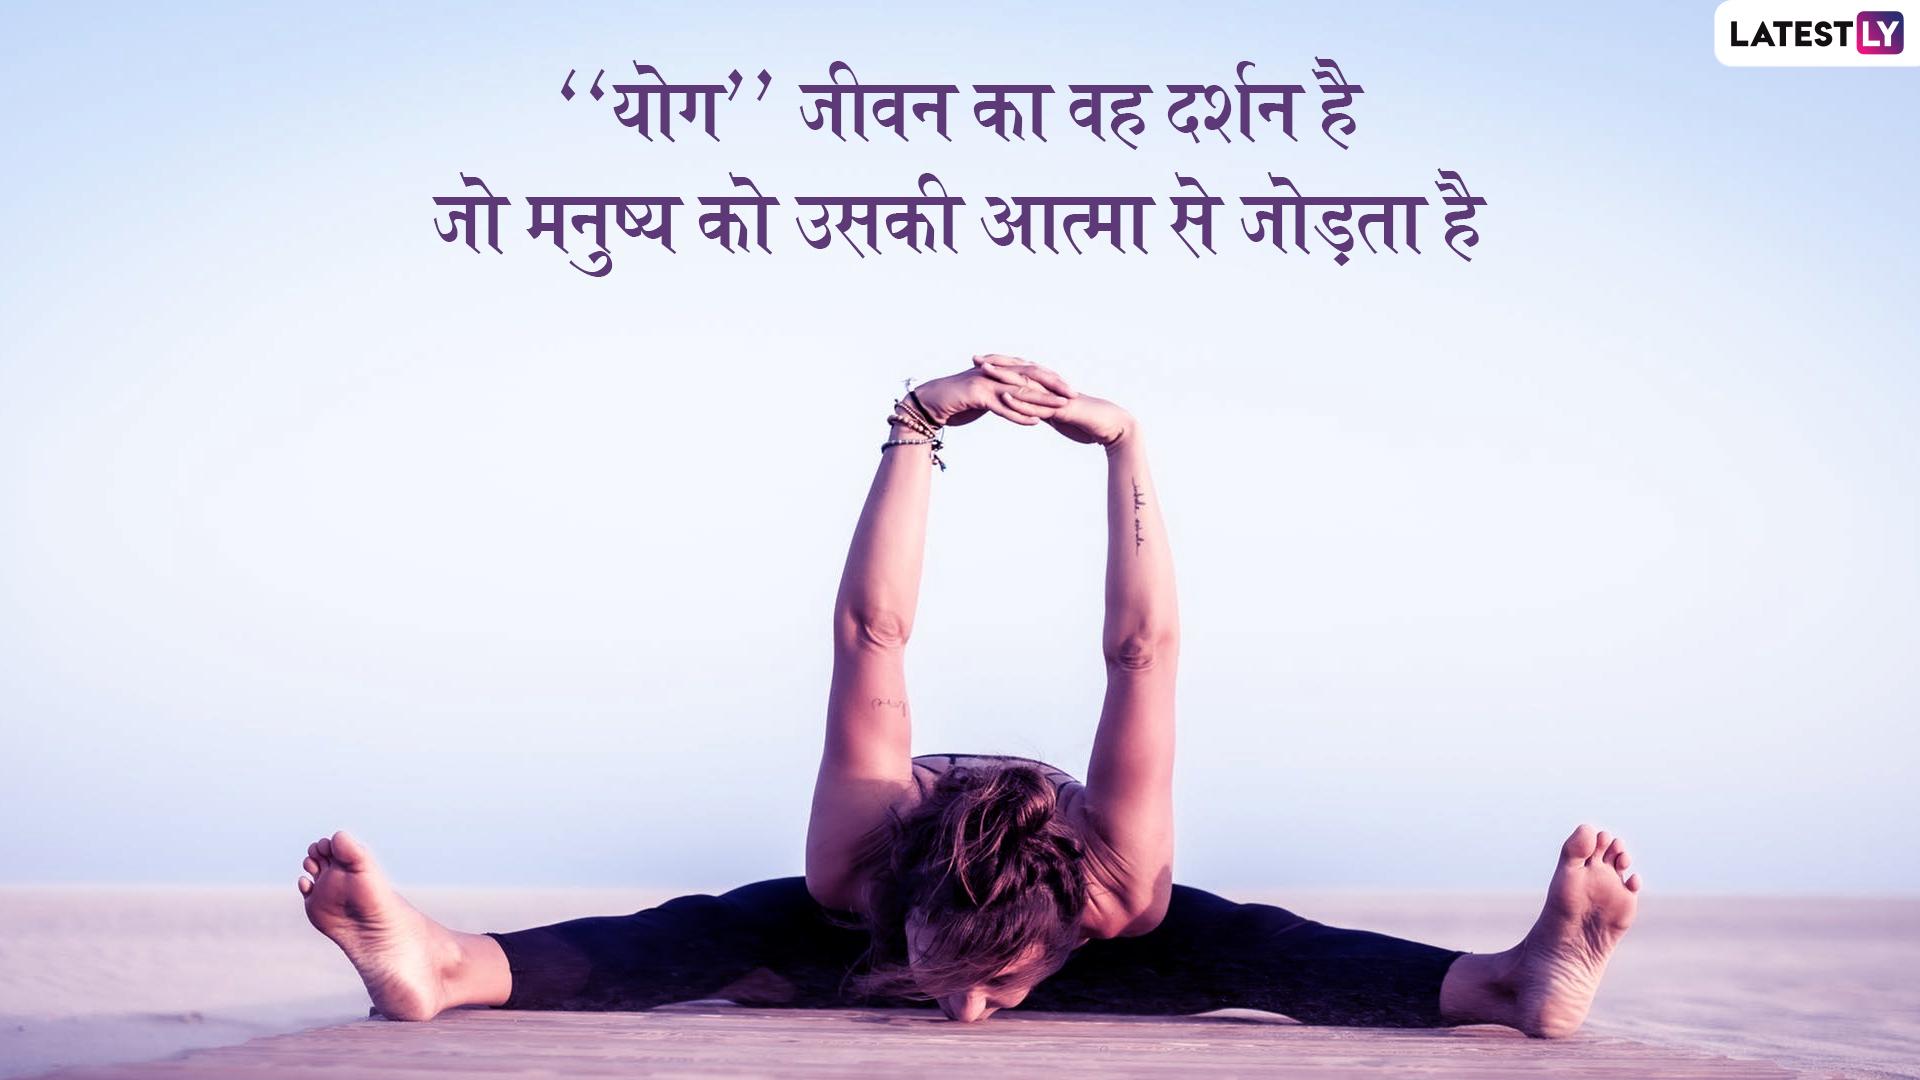 yoga day 2019 wishes in hindi photo credits file image international